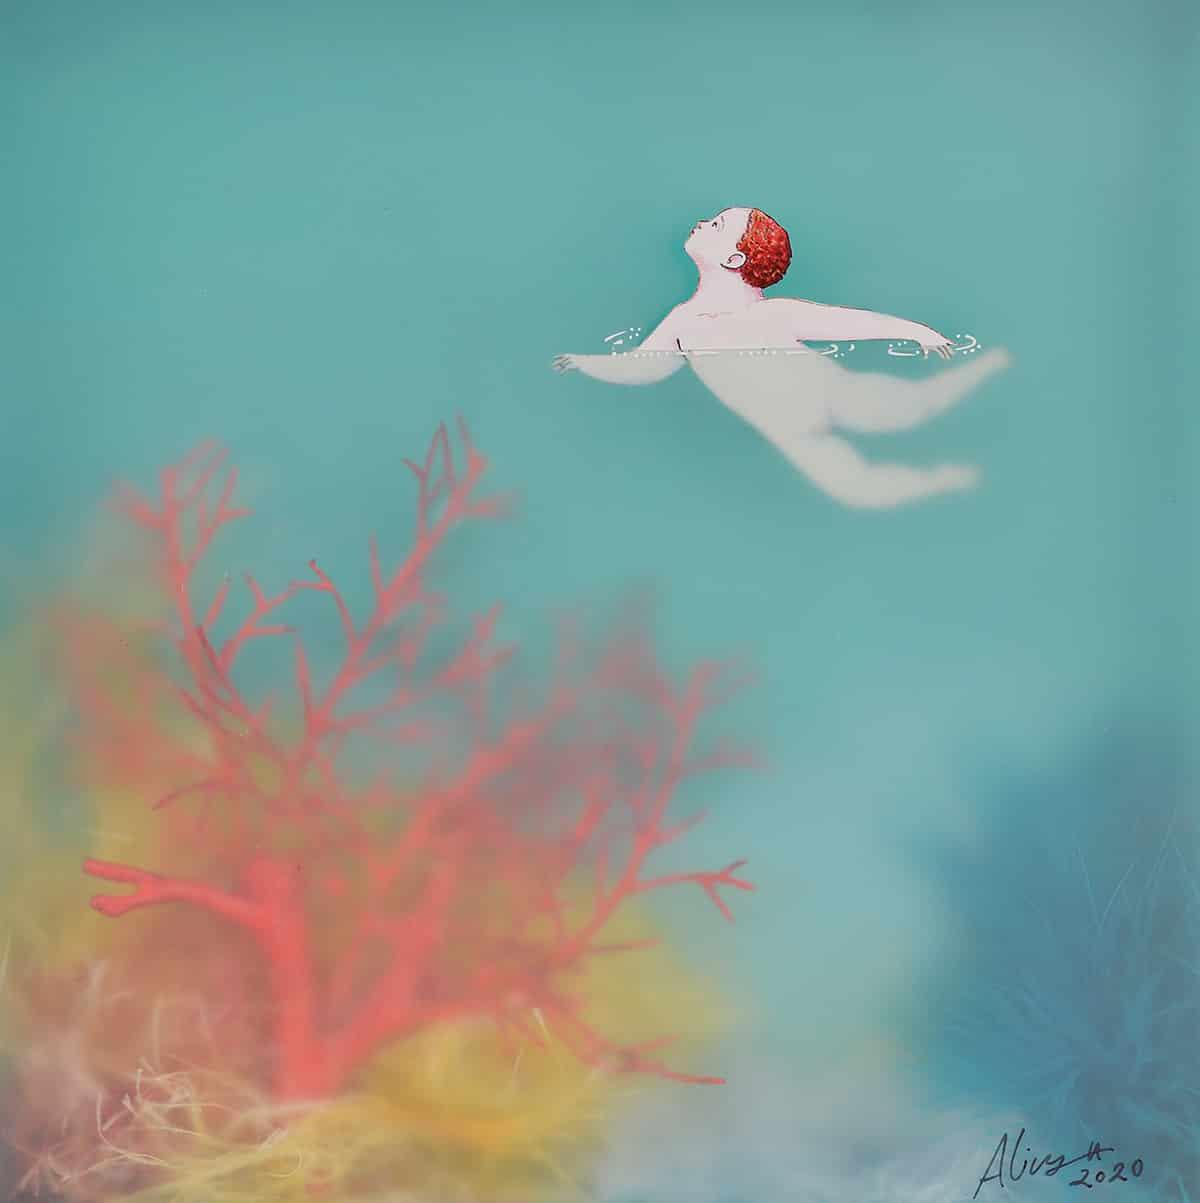 sonia alins mar en calma obra mujeres en little